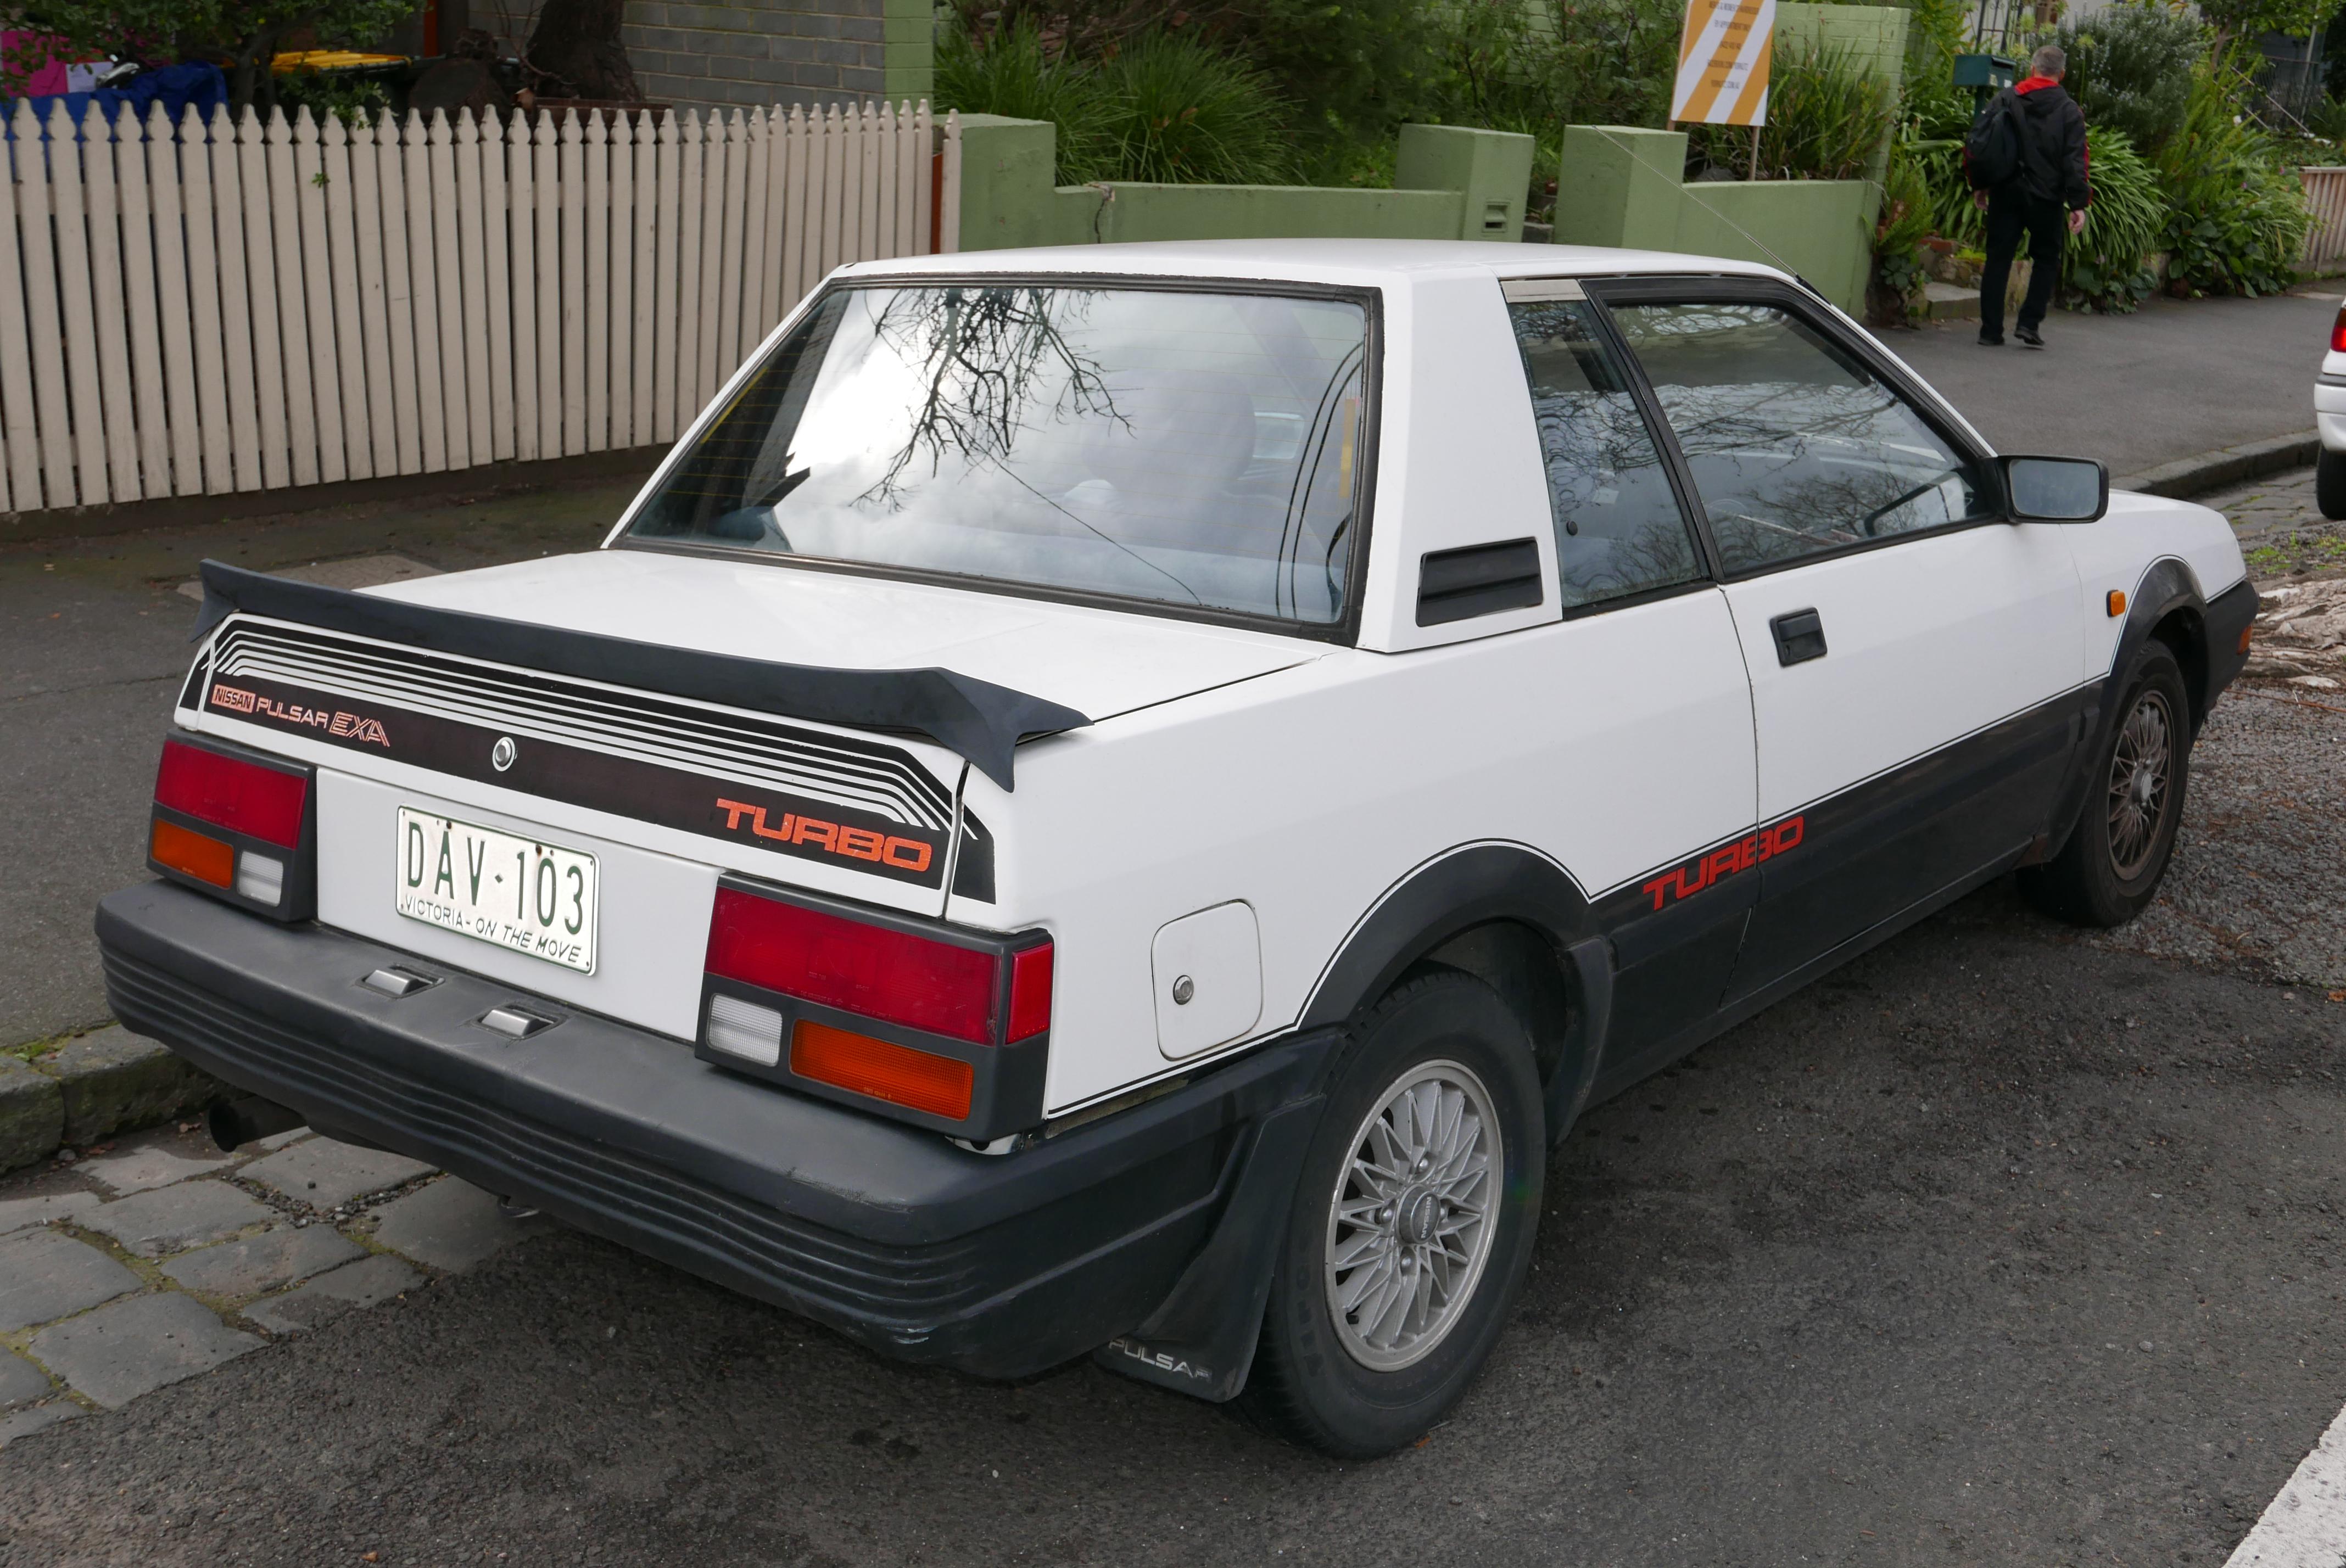 Nissan Pulsar II (N12) 1982 - 1986 Cabriolet #5